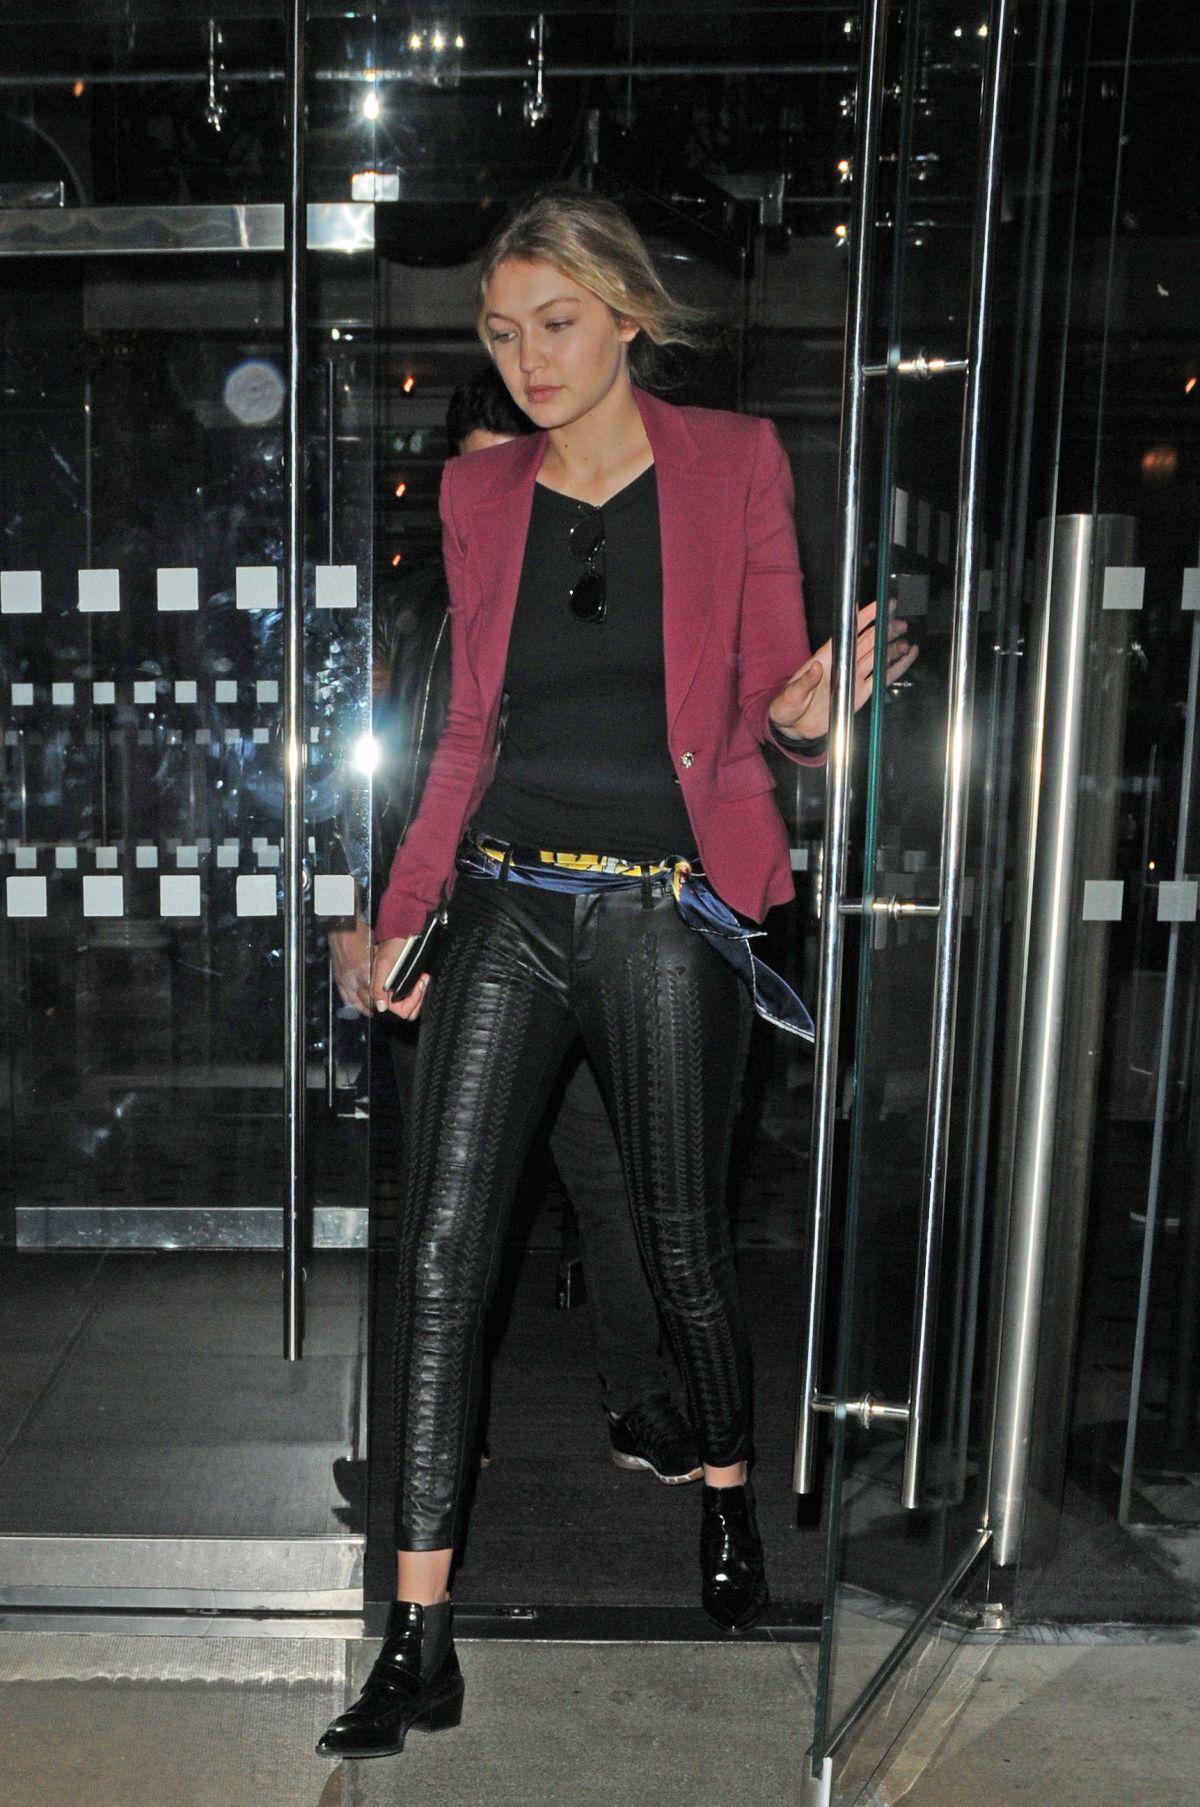 GIGI HADID Leaves Her Hotel in London 06/28/2015